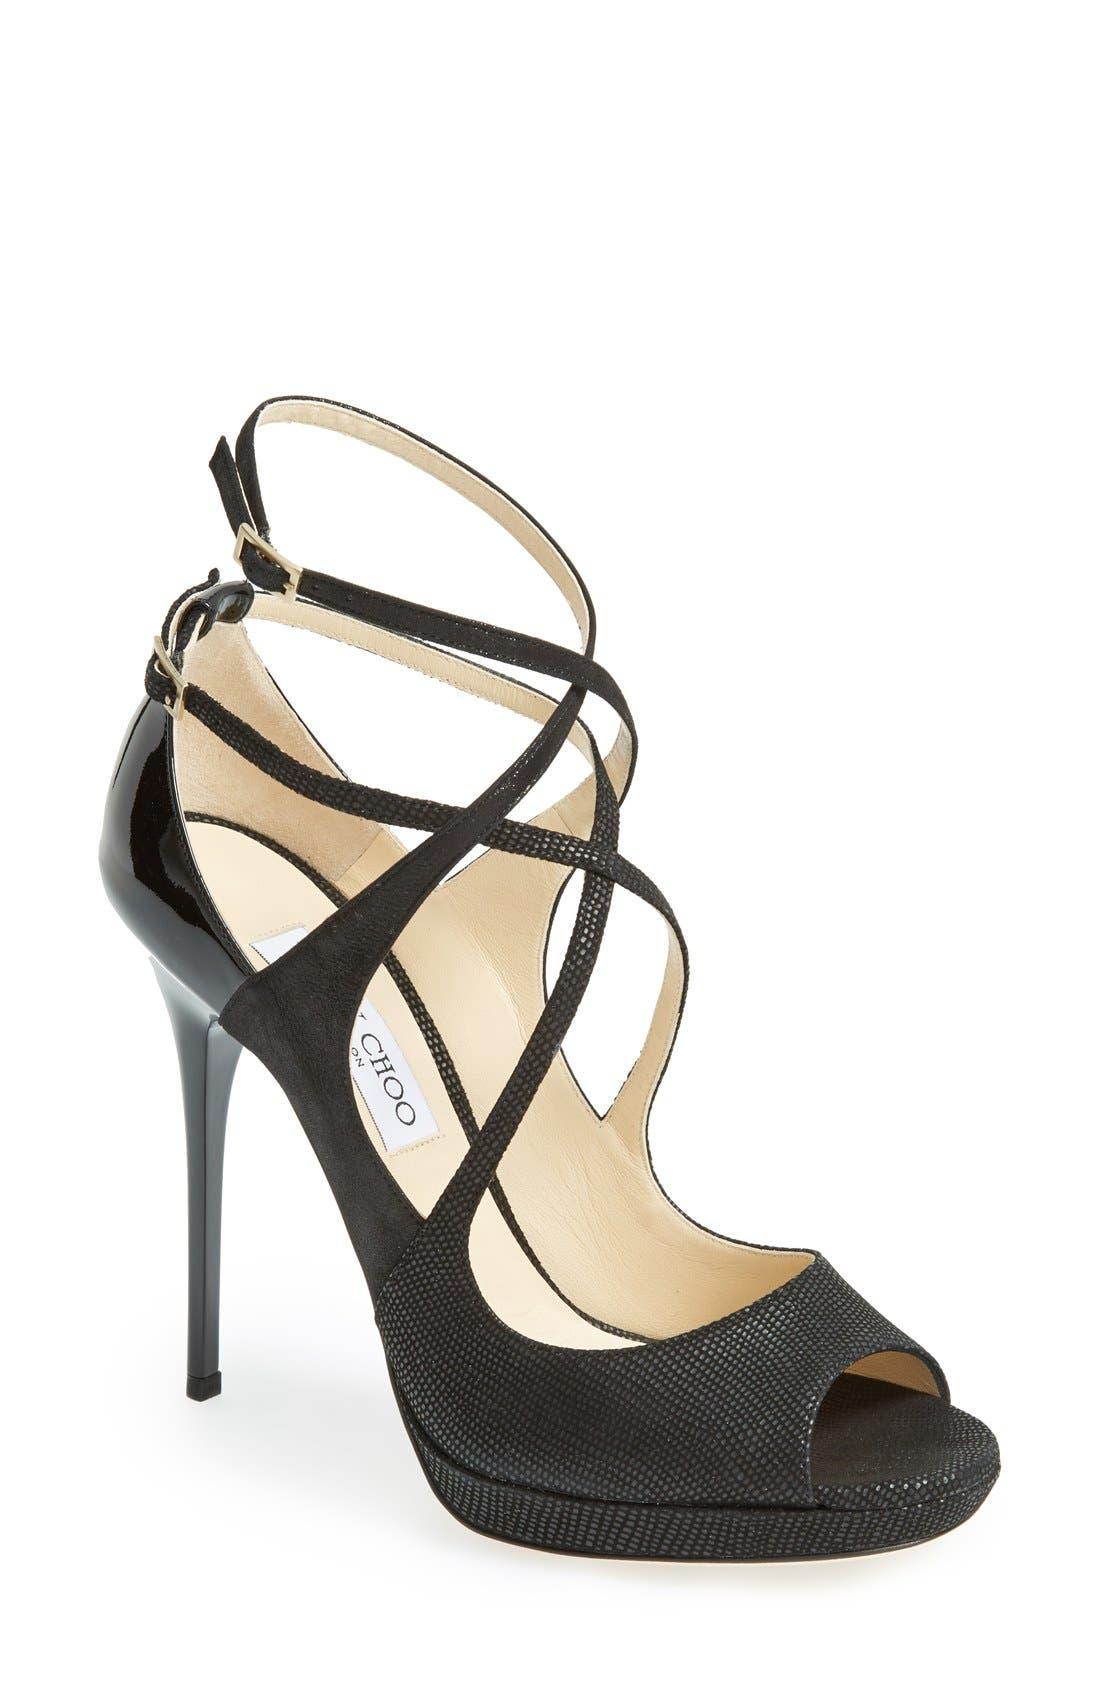 Alternate Image 1 Selected - Jimmy Choo 'Atlas' Platform Sandal (Women)